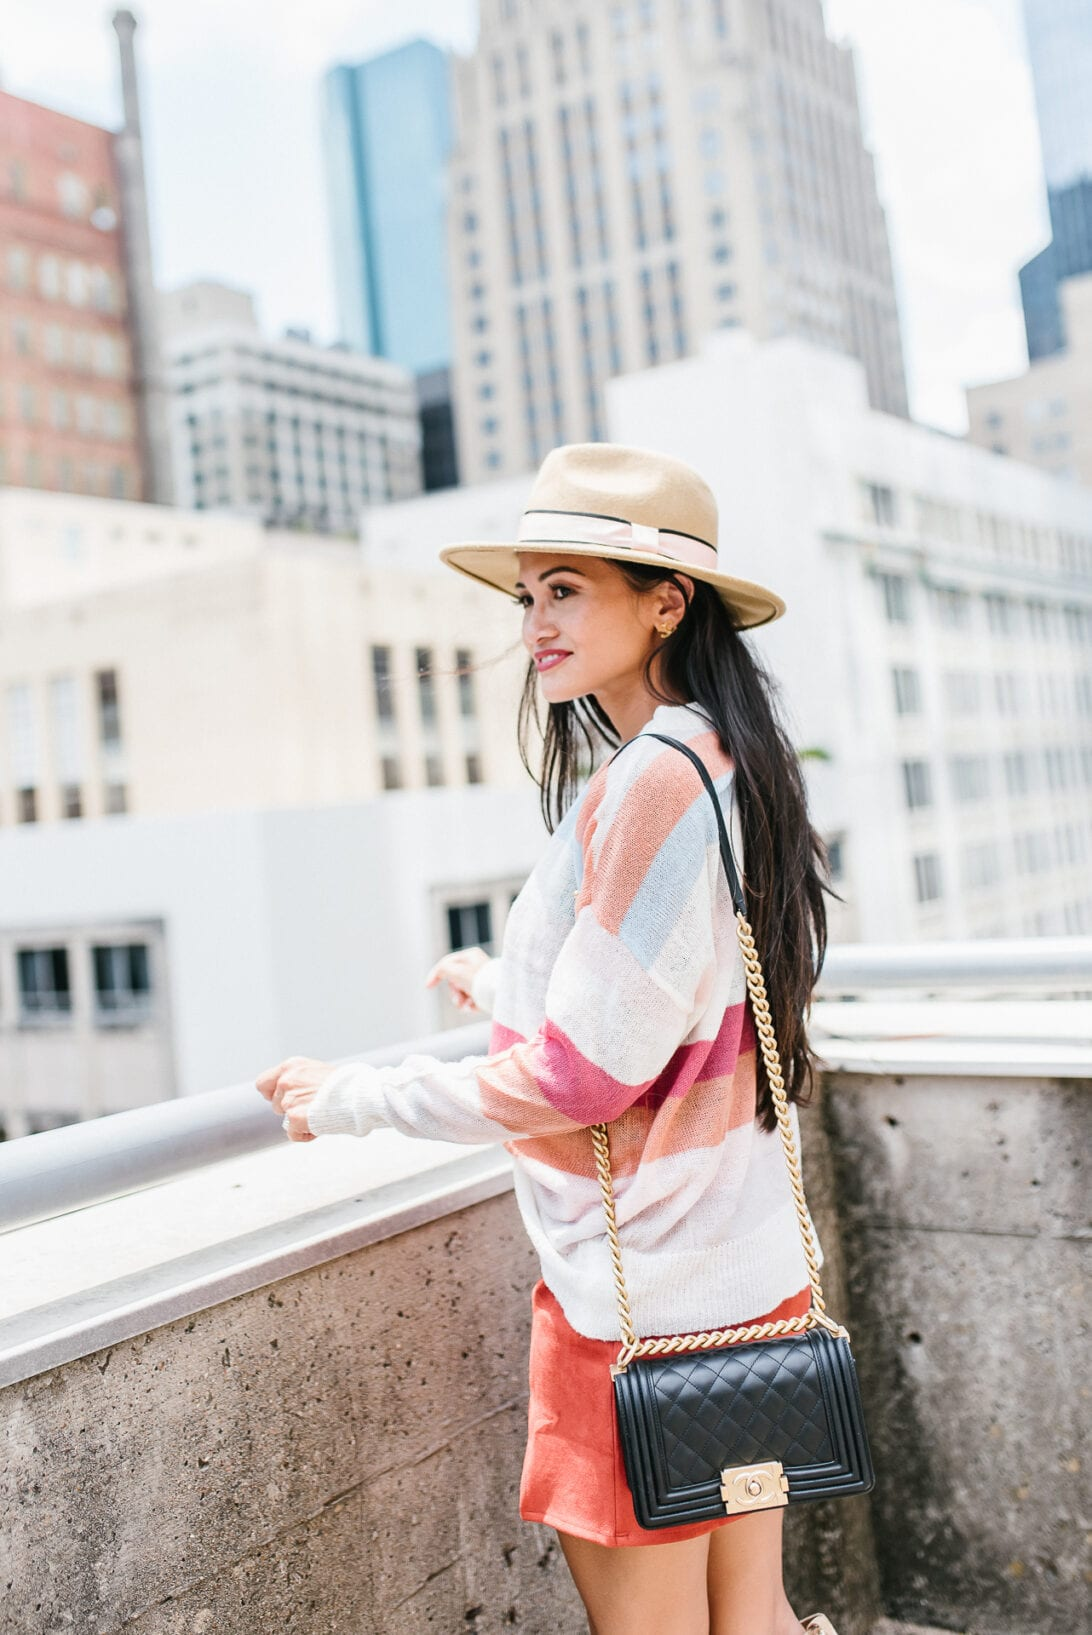 chanel boy bag, fall outfit, fall style, mini skirt, luxury handbag review